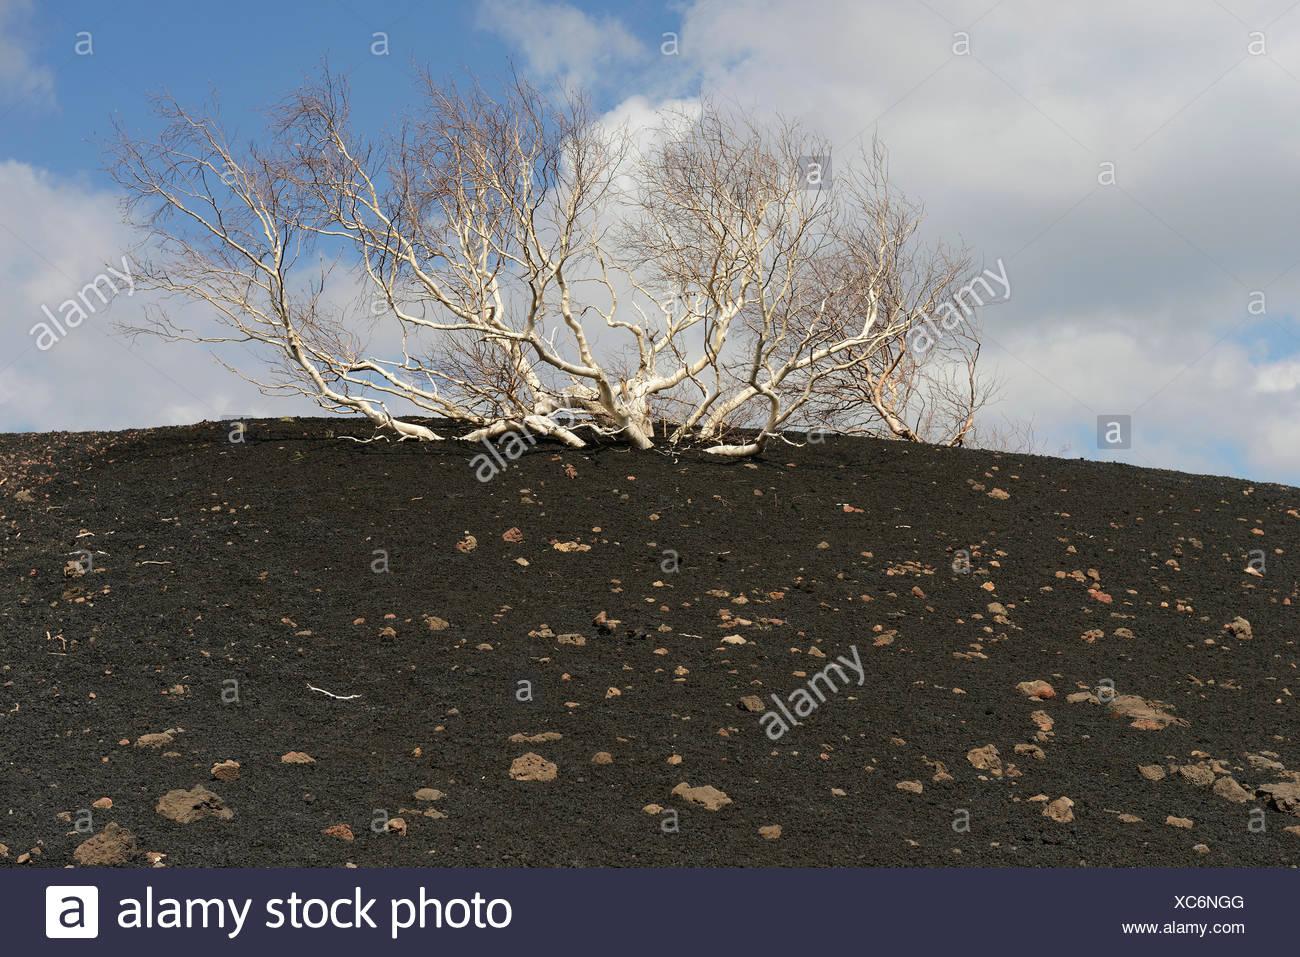 Etna Birch (Betula aetnensis), Parco dell'Etna, Sicily, Italy - Stock Image